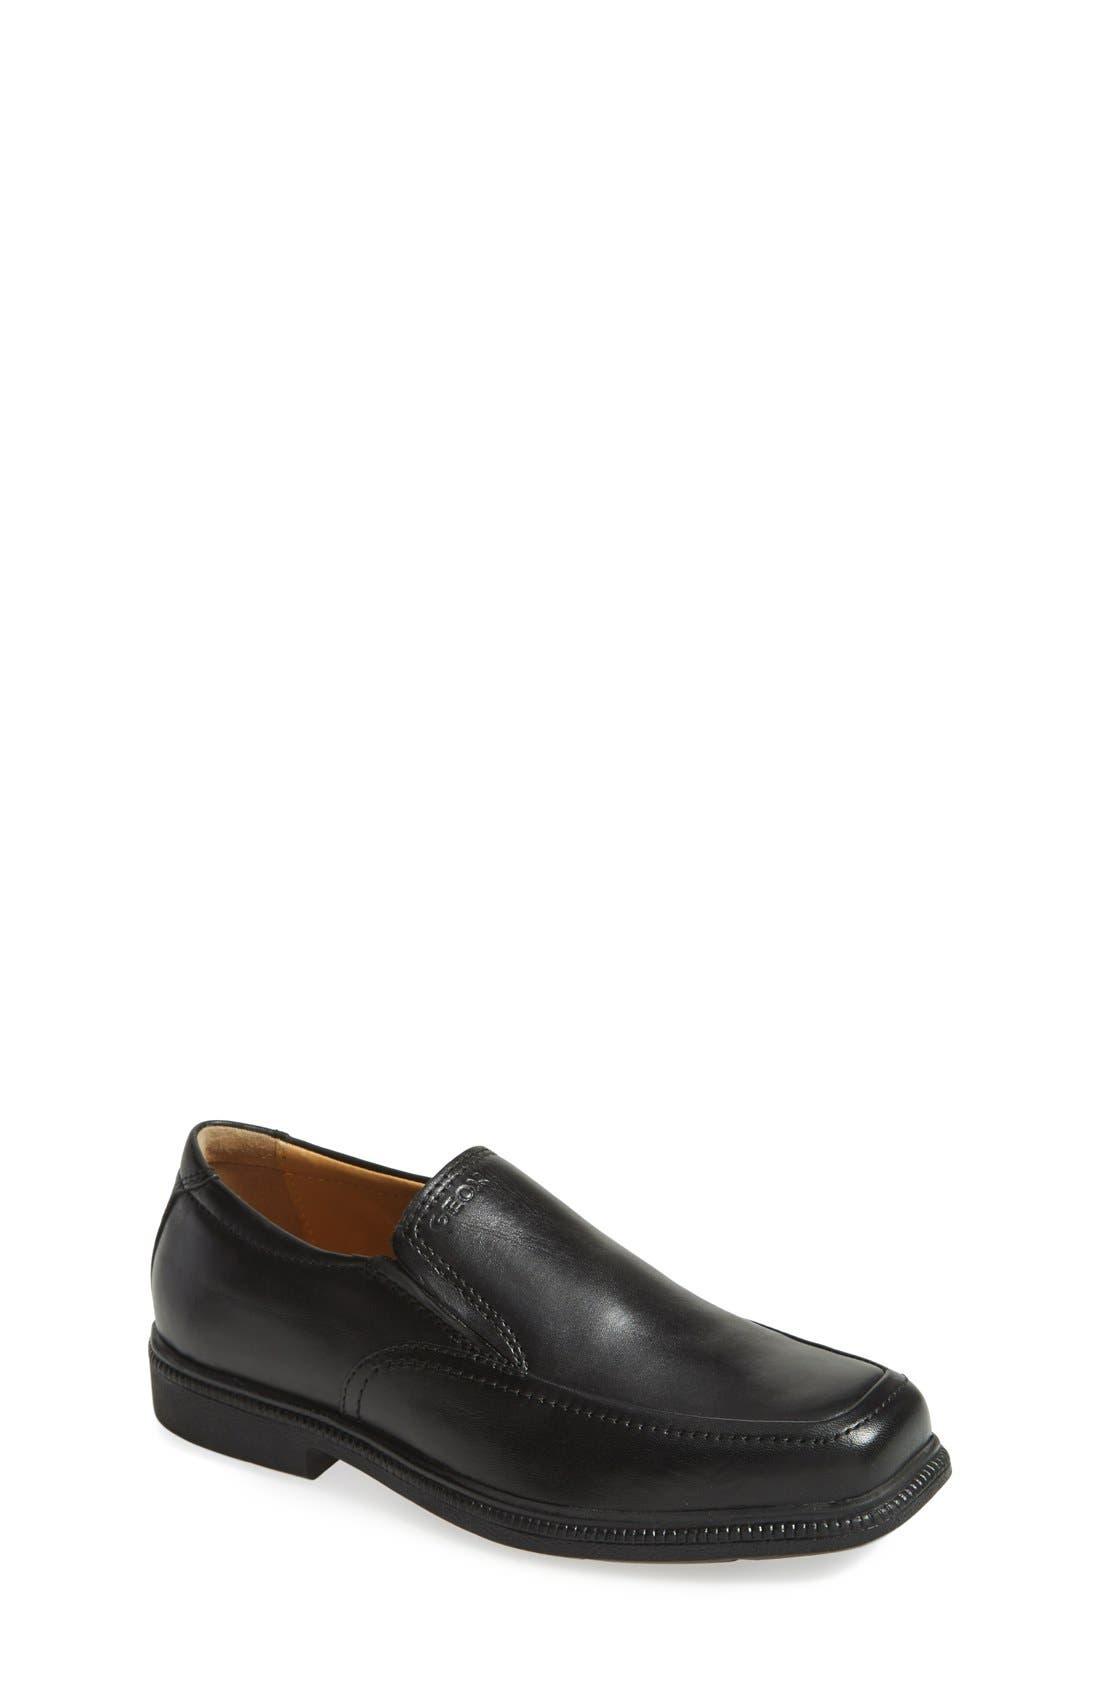 'Federico' Loafer,                         Main,                         color, Black